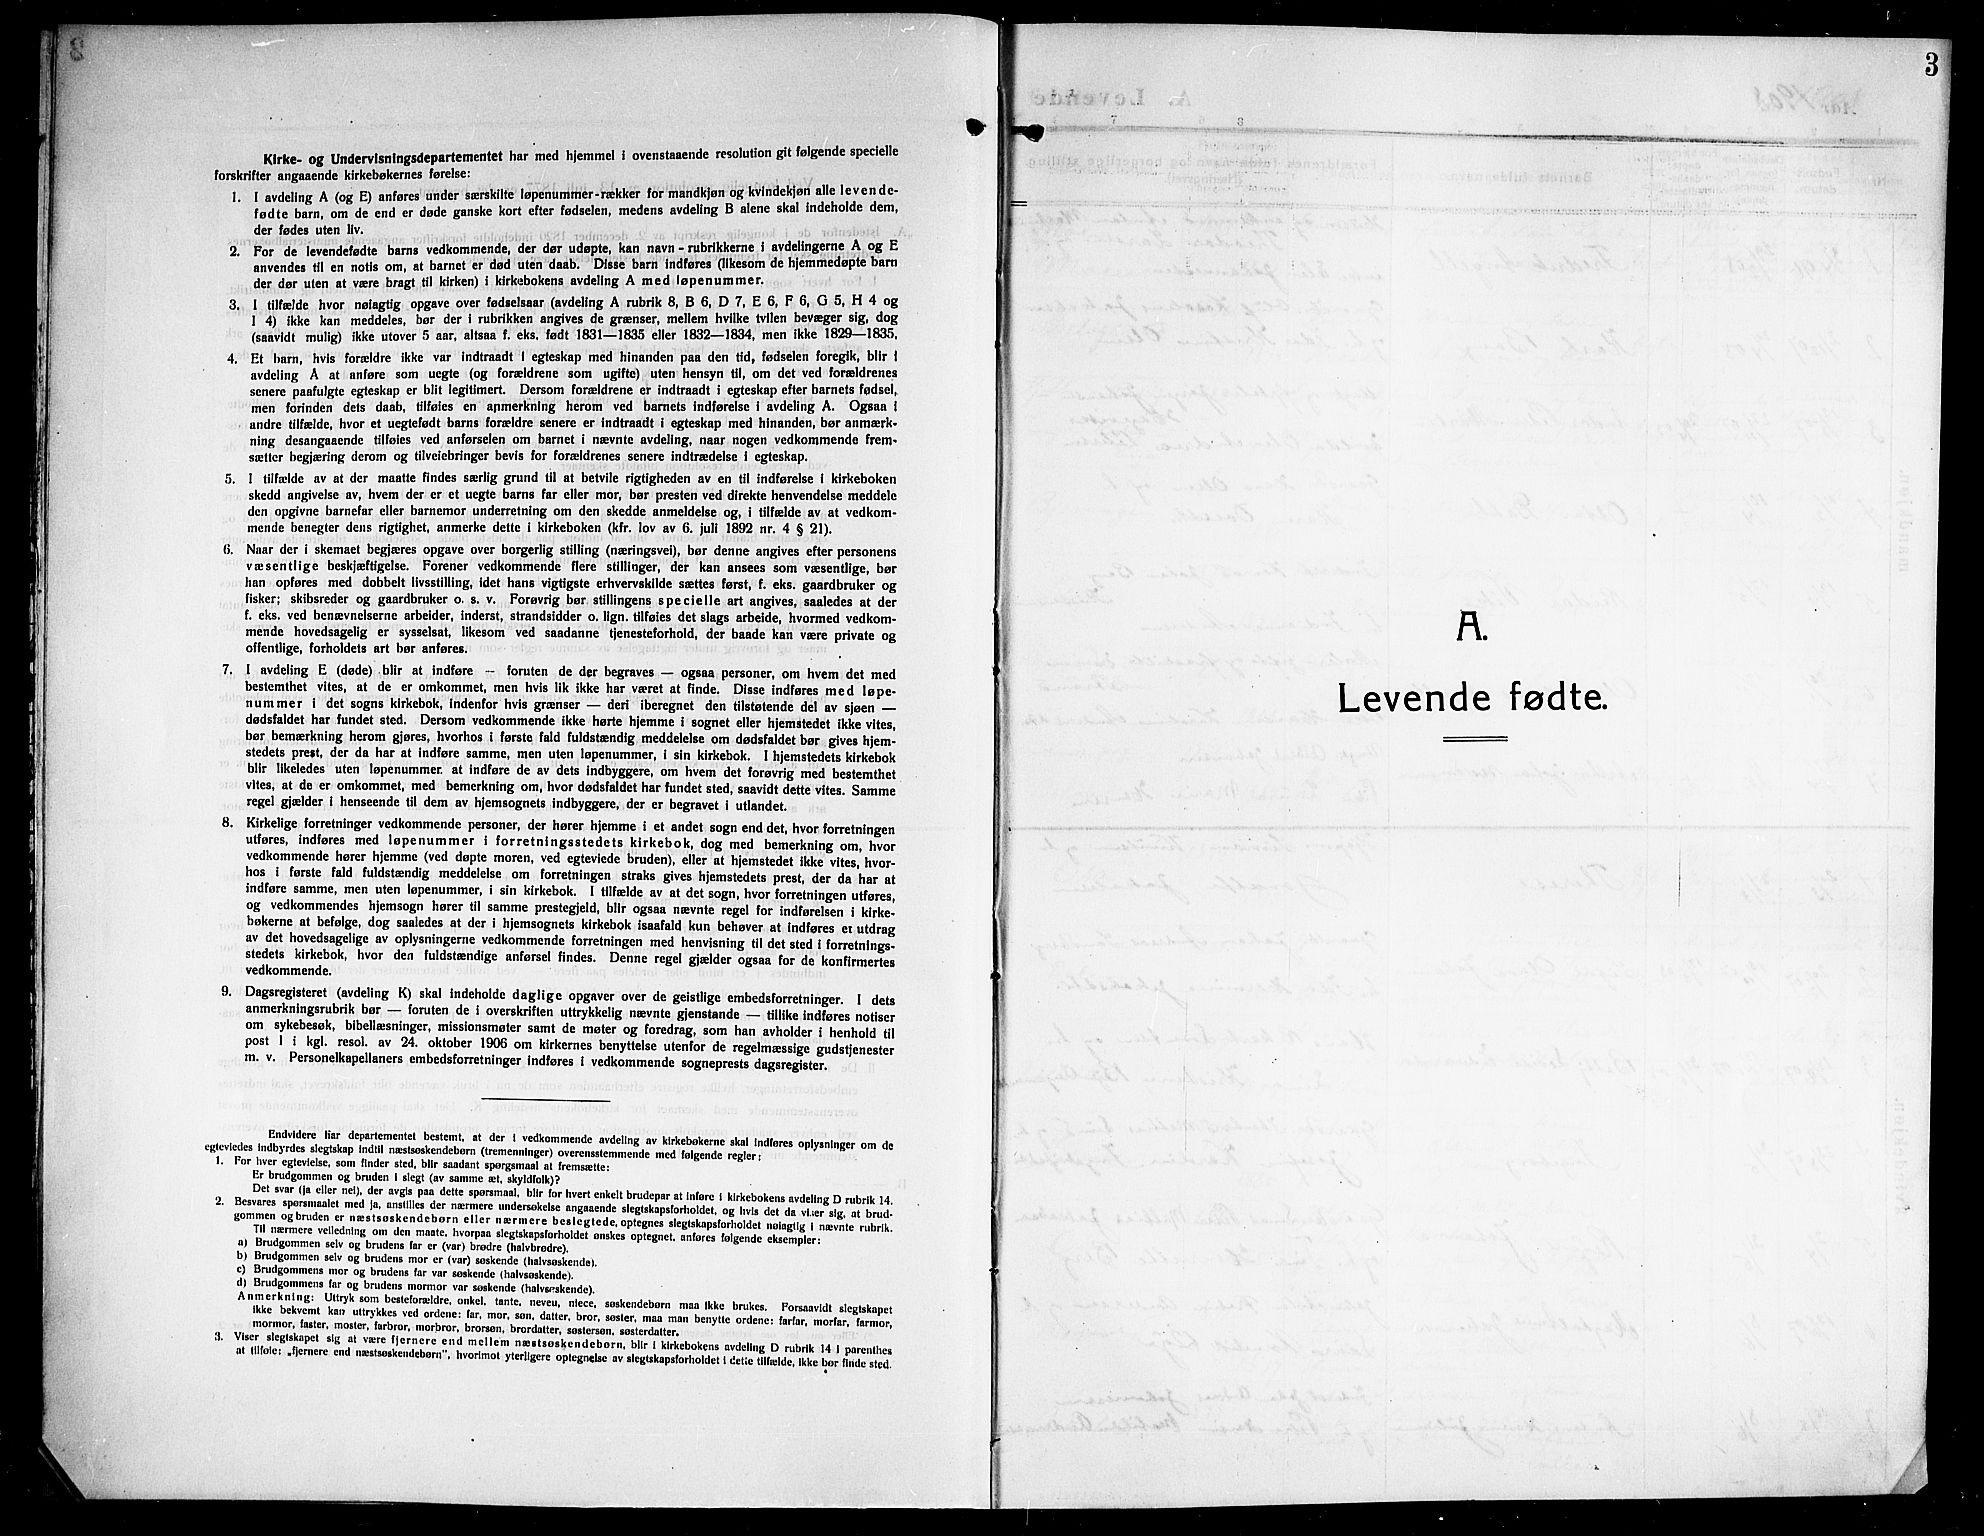 SAT, Ministerialprotokoller, klokkerbøker og fødselsregistre - Nordland, 843/L0639: Klokkerbok nr. 843C08, 1908-1924, s. 3